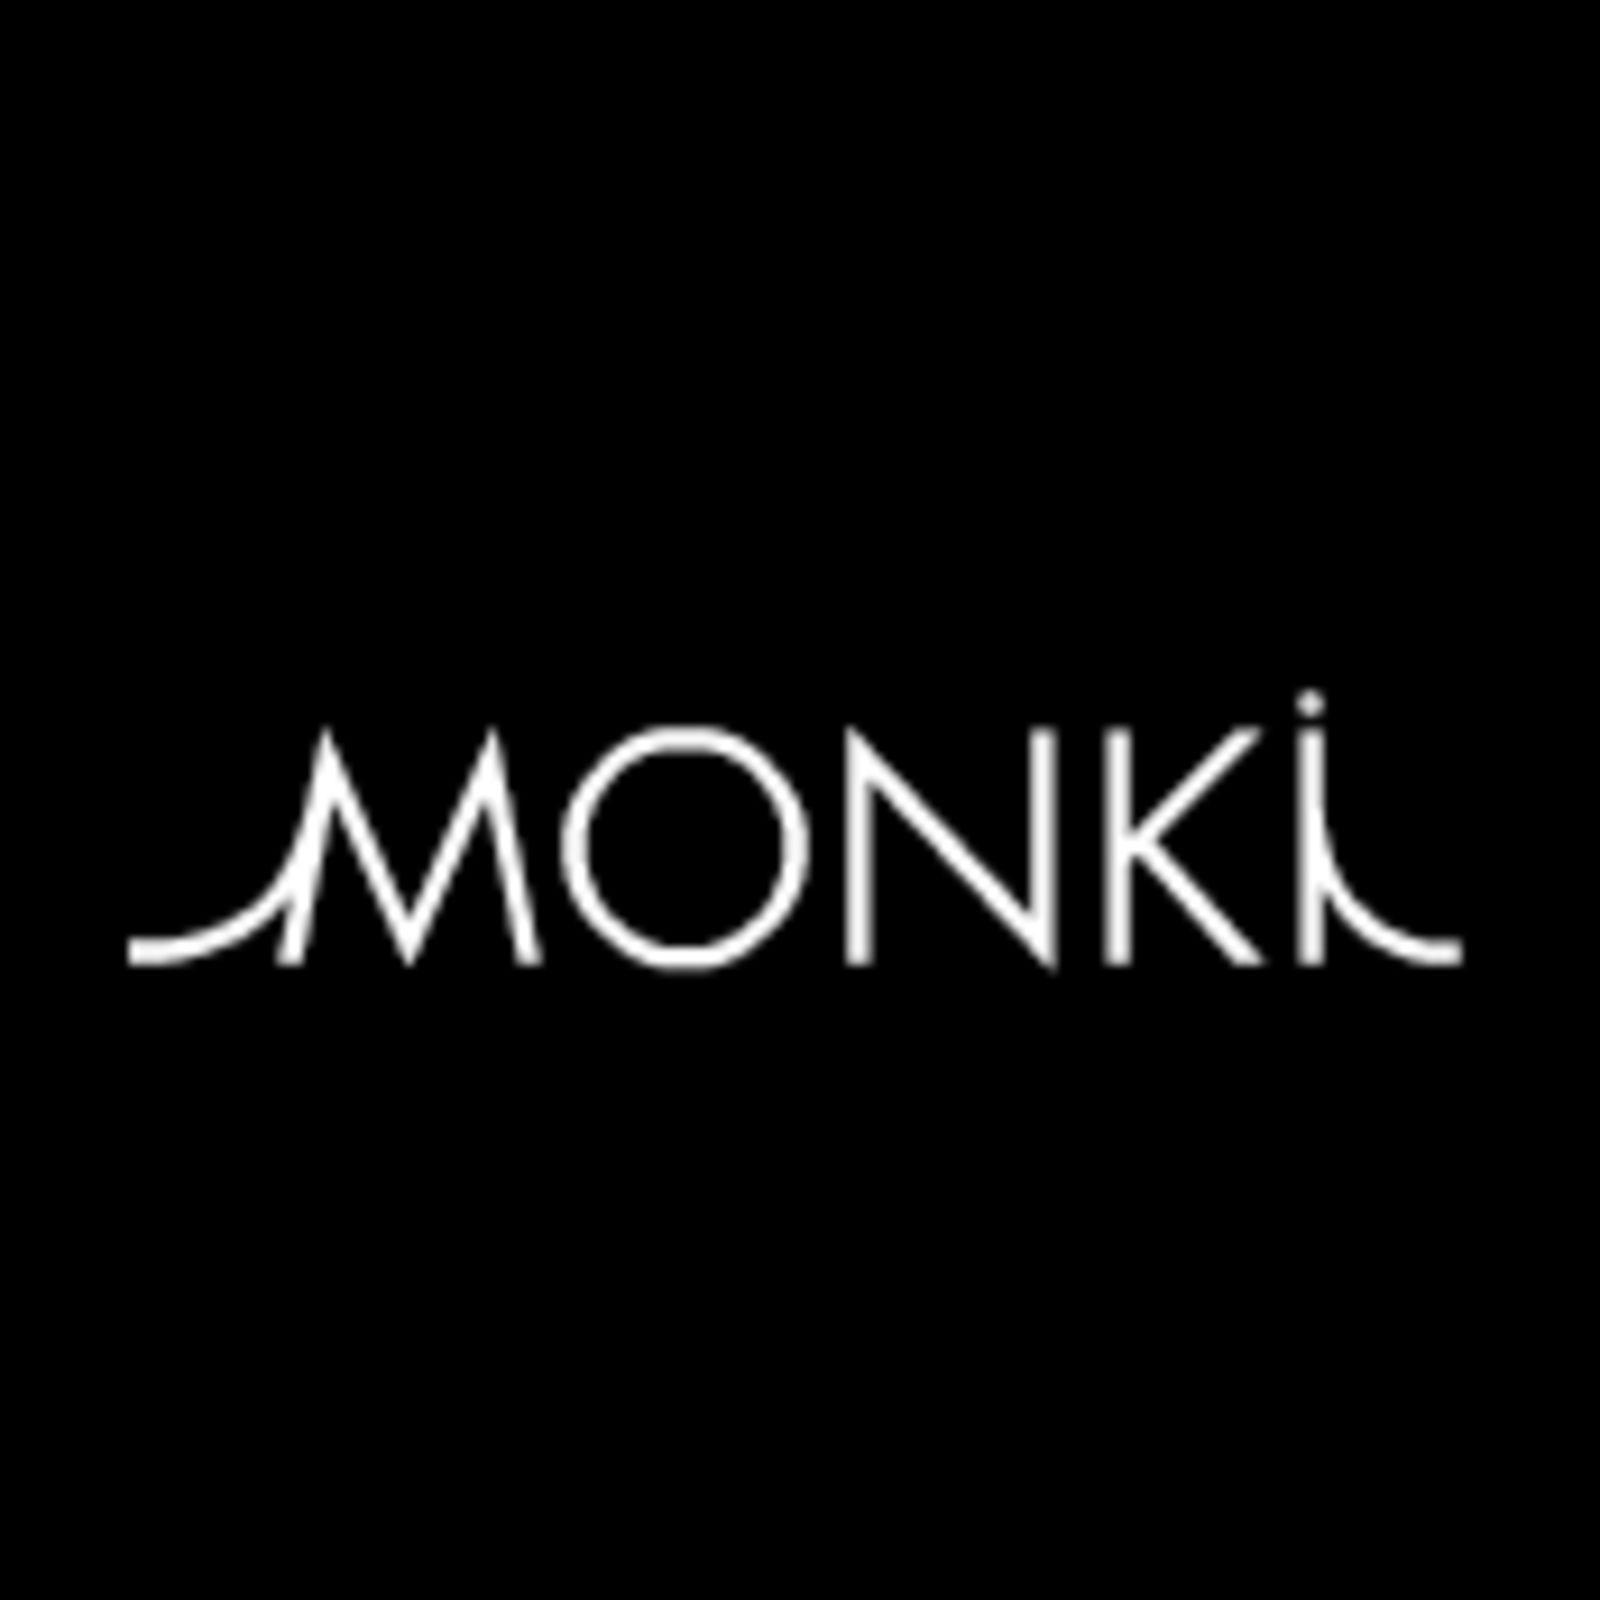 MONKI (Image 1)